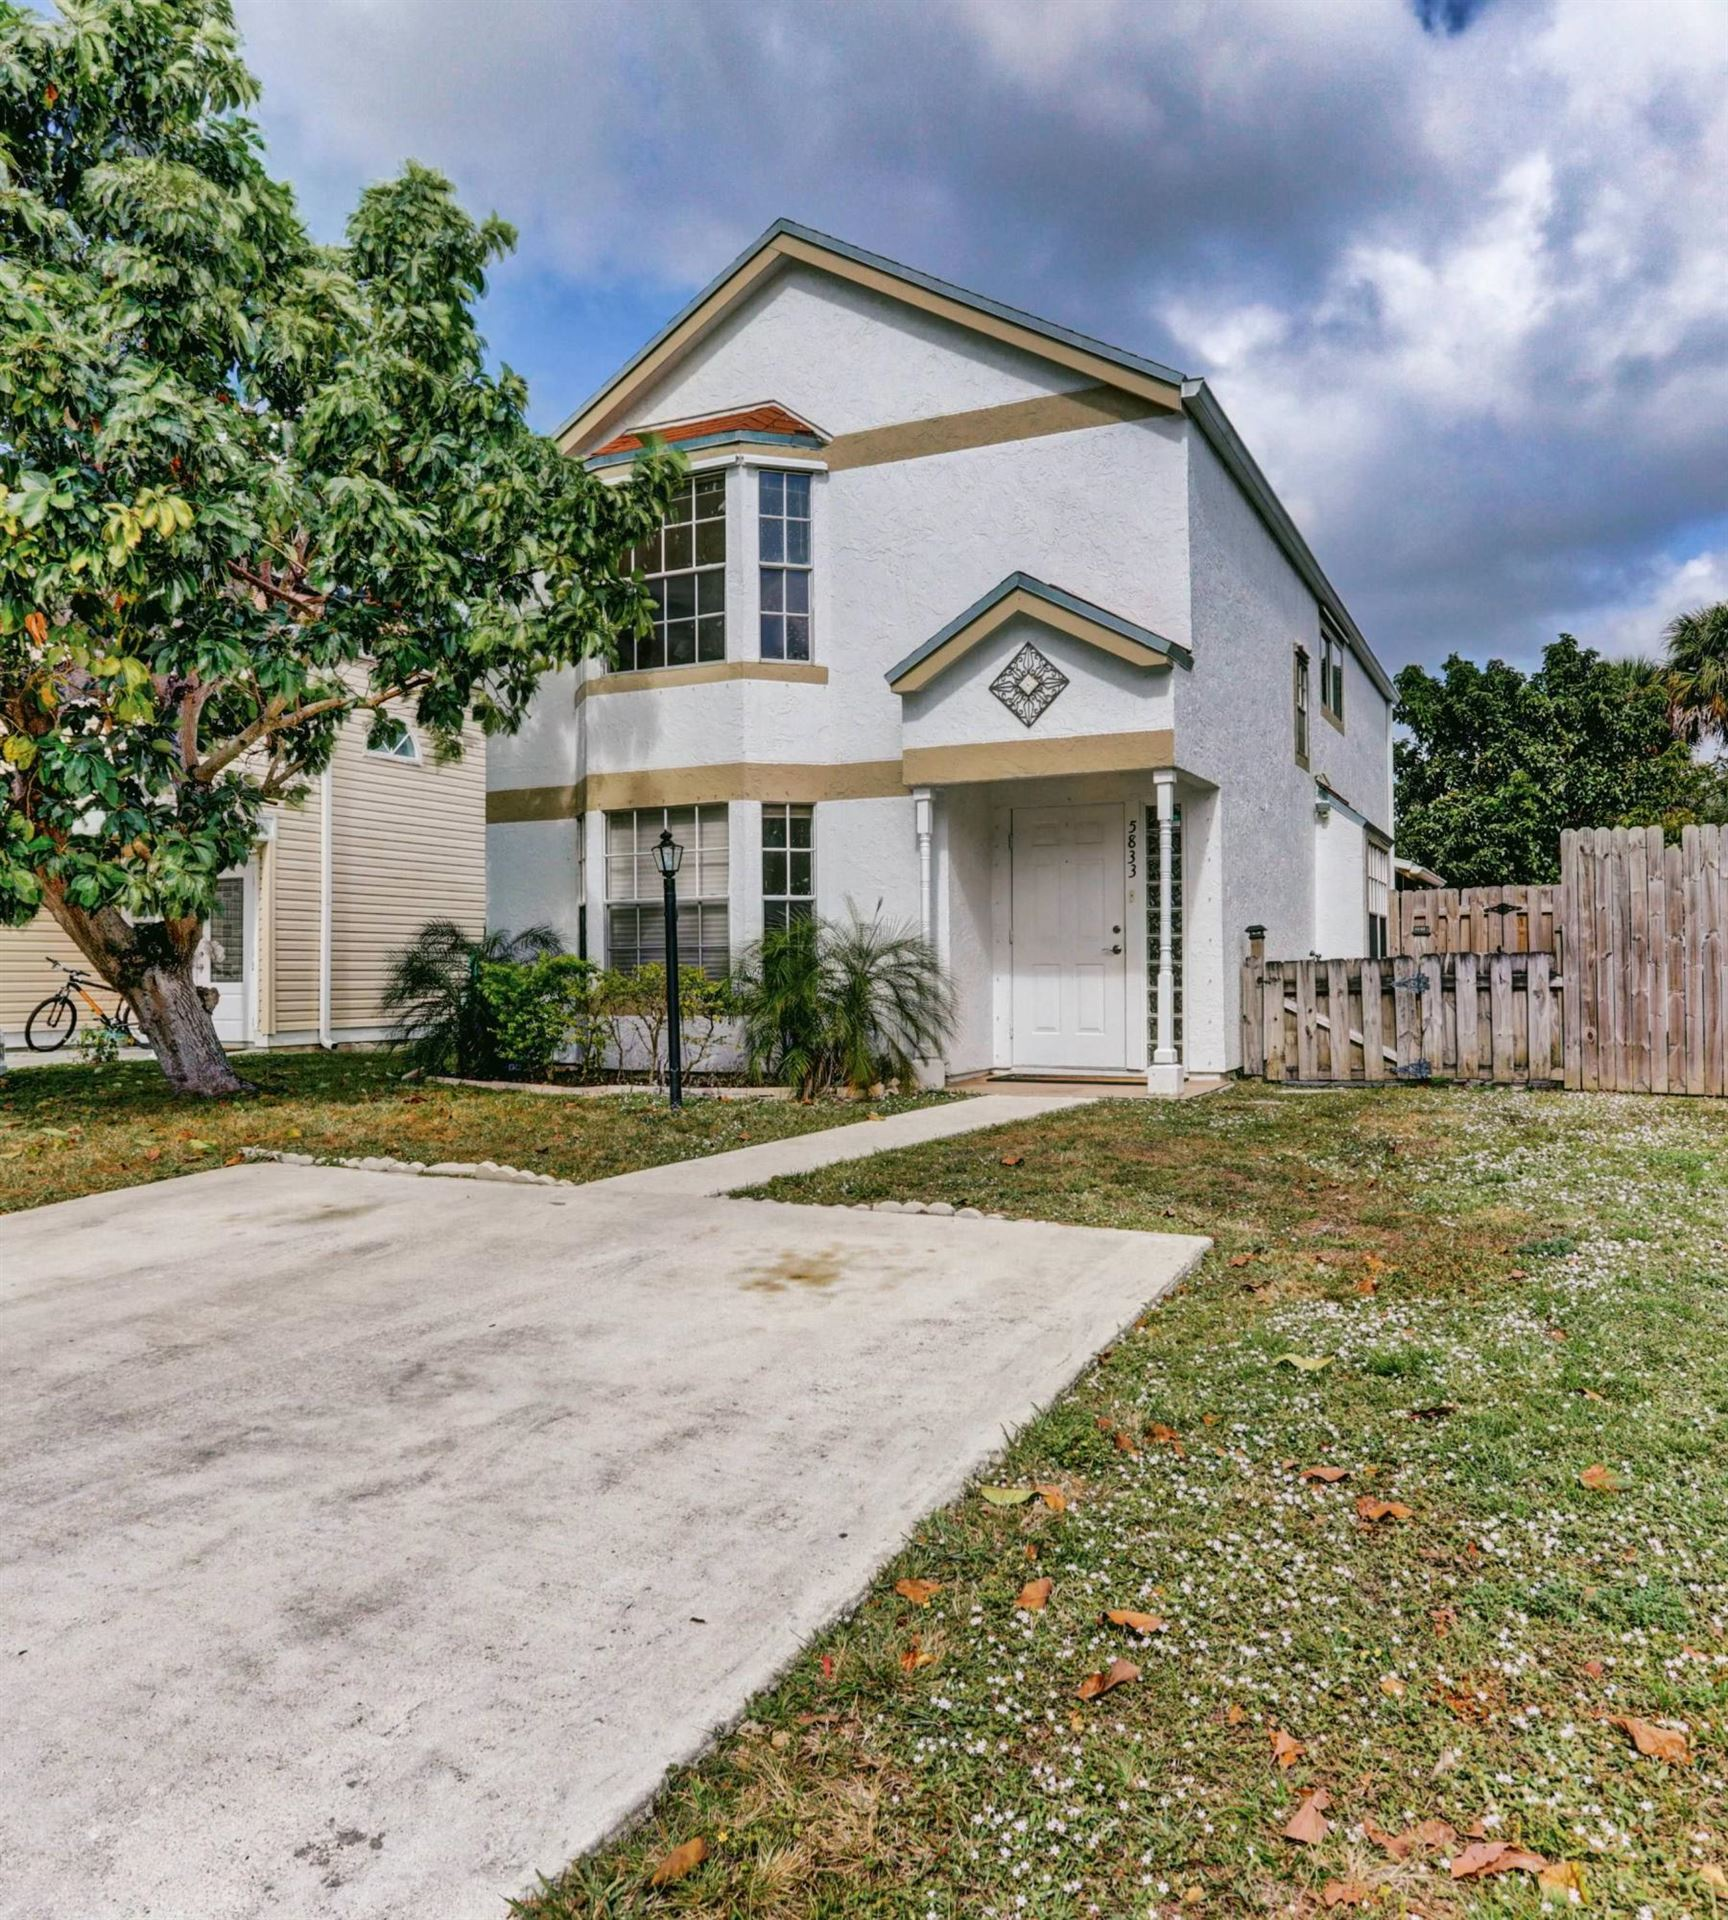 Photo of 5833 Cassandra Court, West Palm Beach, FL 33415 (MLS # RX-10687357)